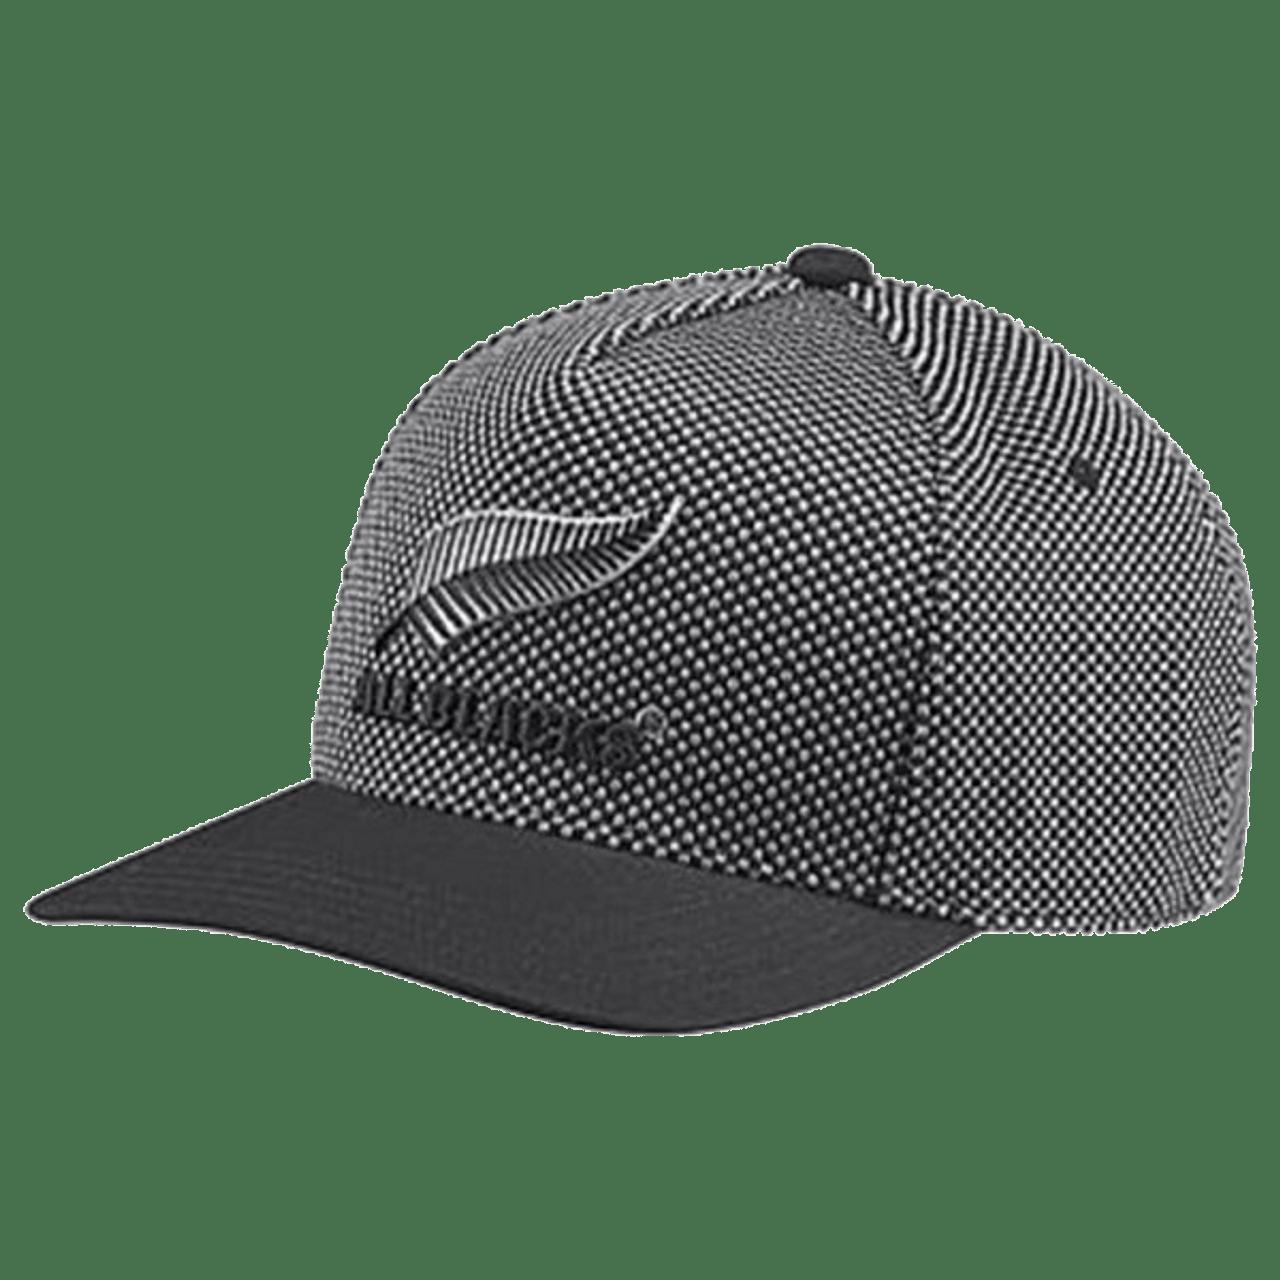 a496df88c9320 Adidas New Zealand All Blacks Flat Cap - Black Gray - Rugby City